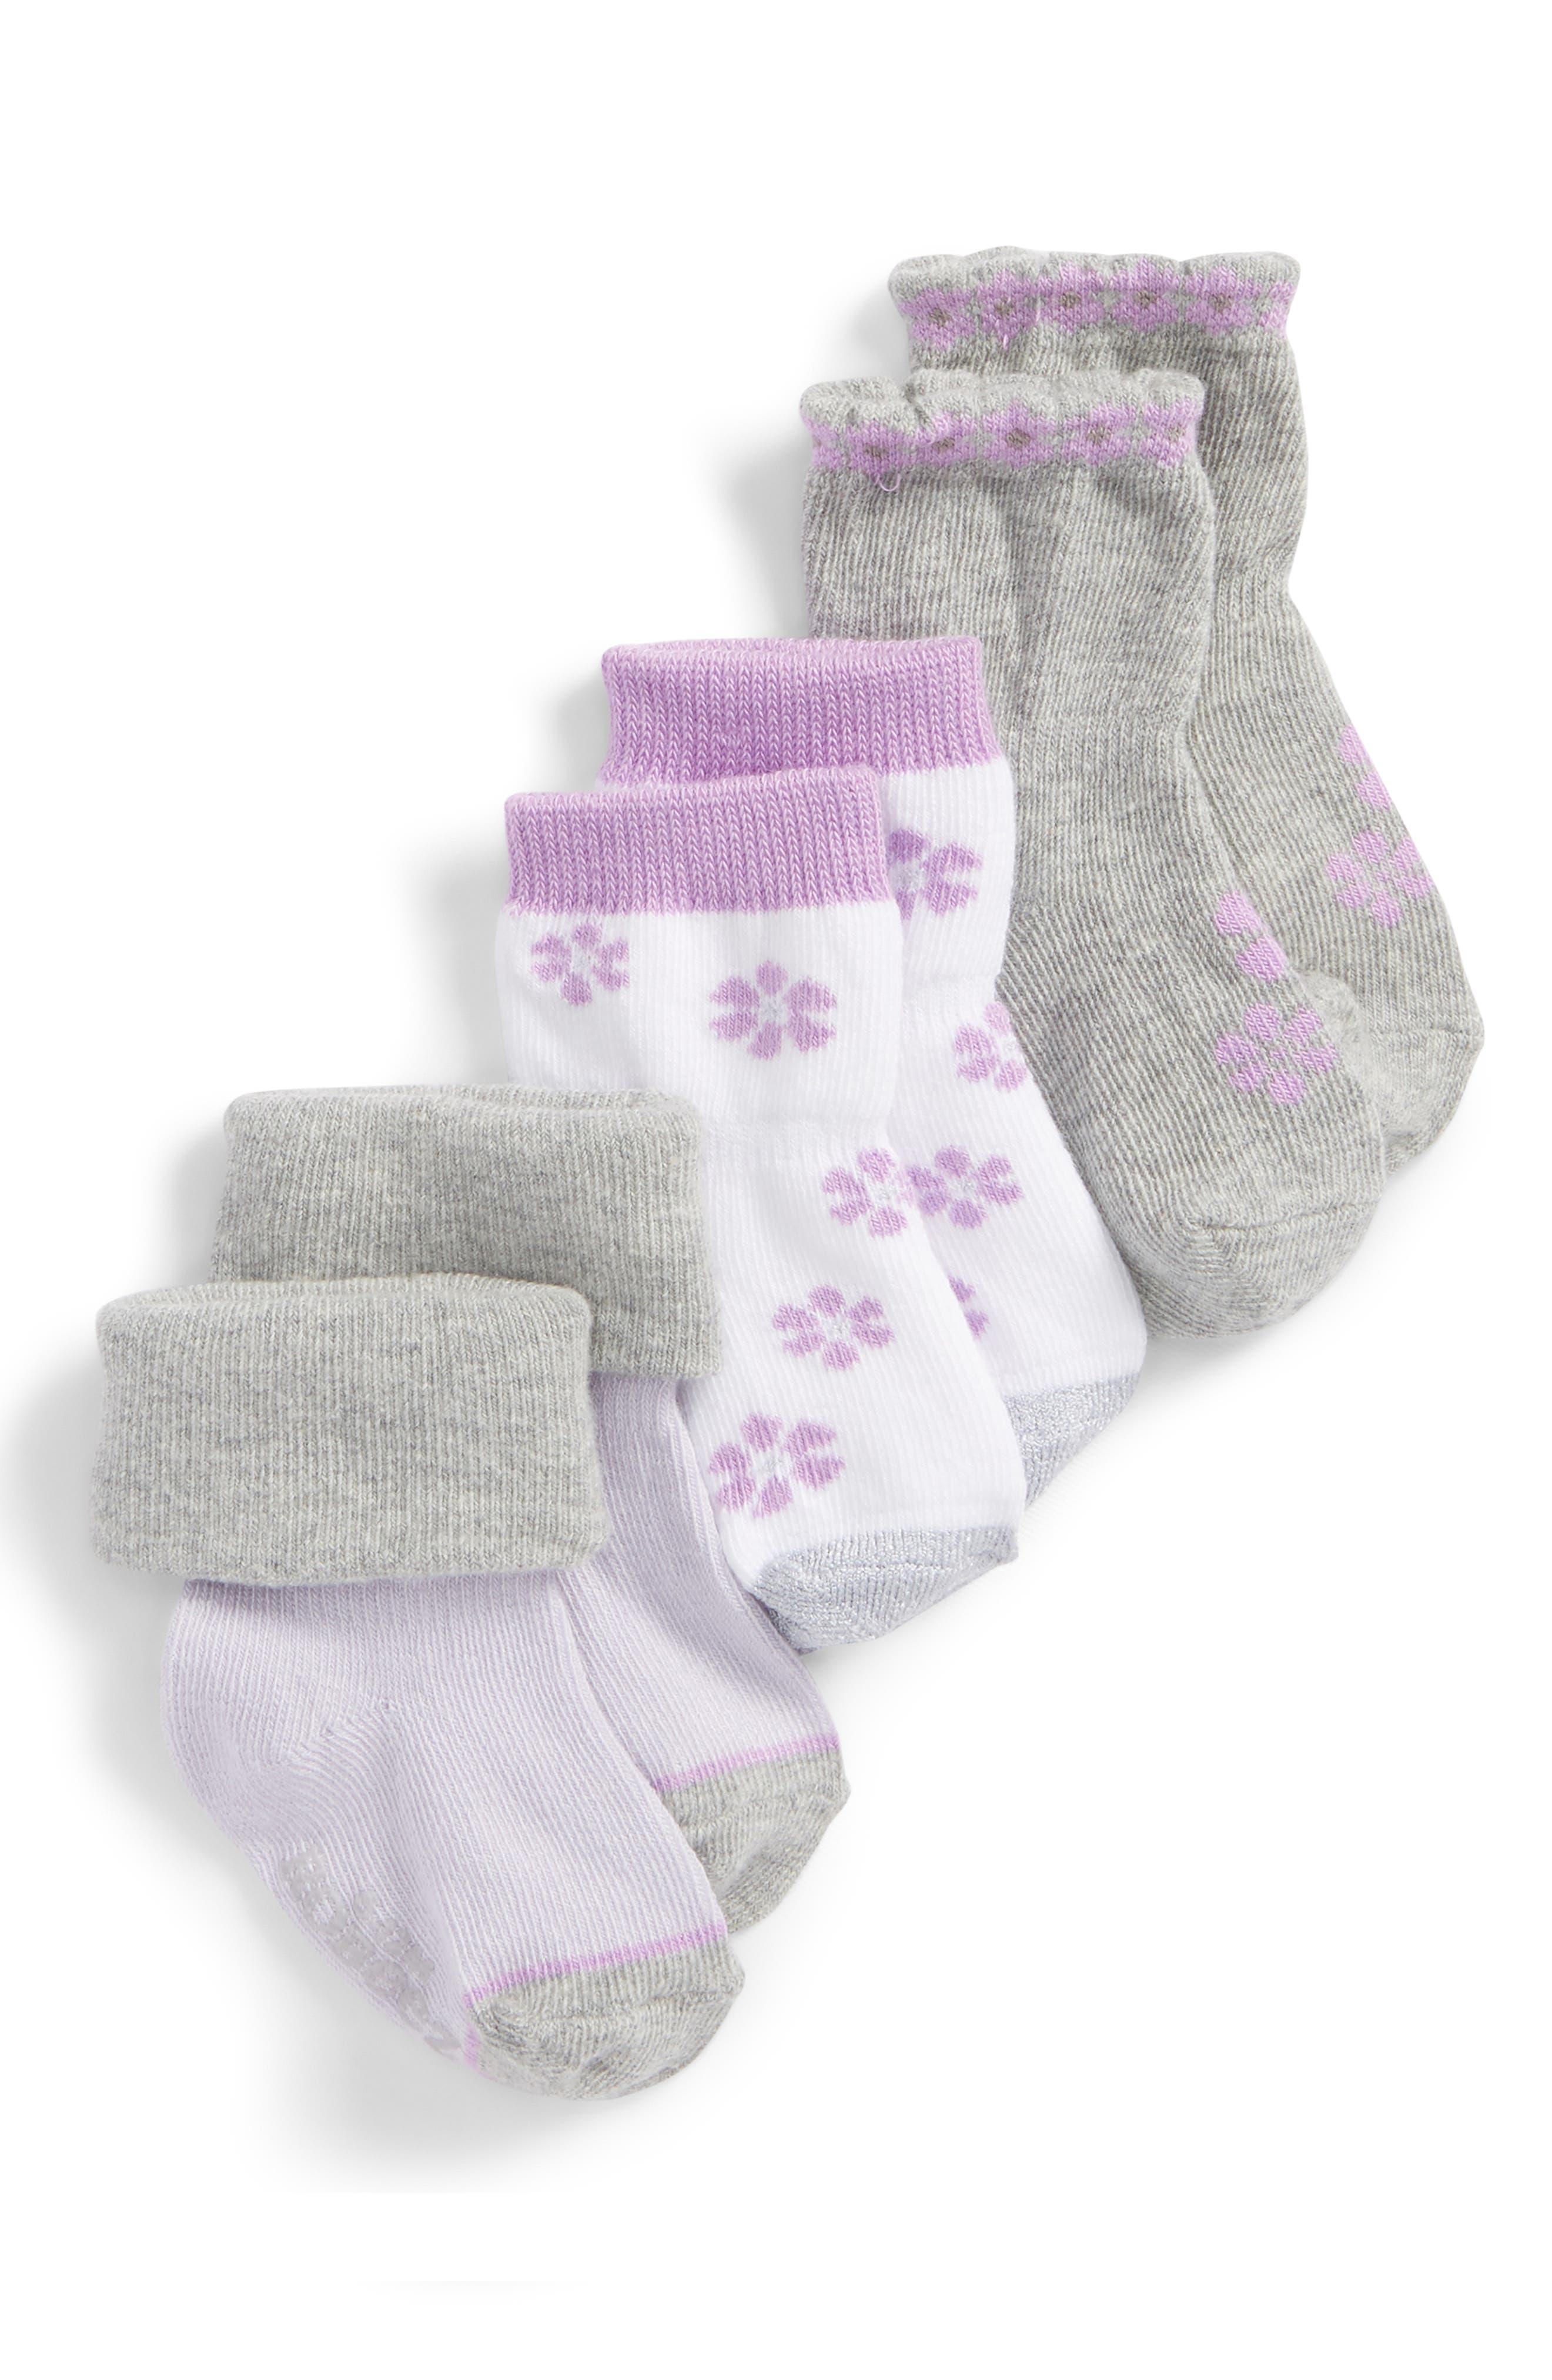 ROBEEZ<SUP>®</SUP> Purple Flowers 3-Pack Socks, Main, color, PURPLE/ GRAY/ WHITE